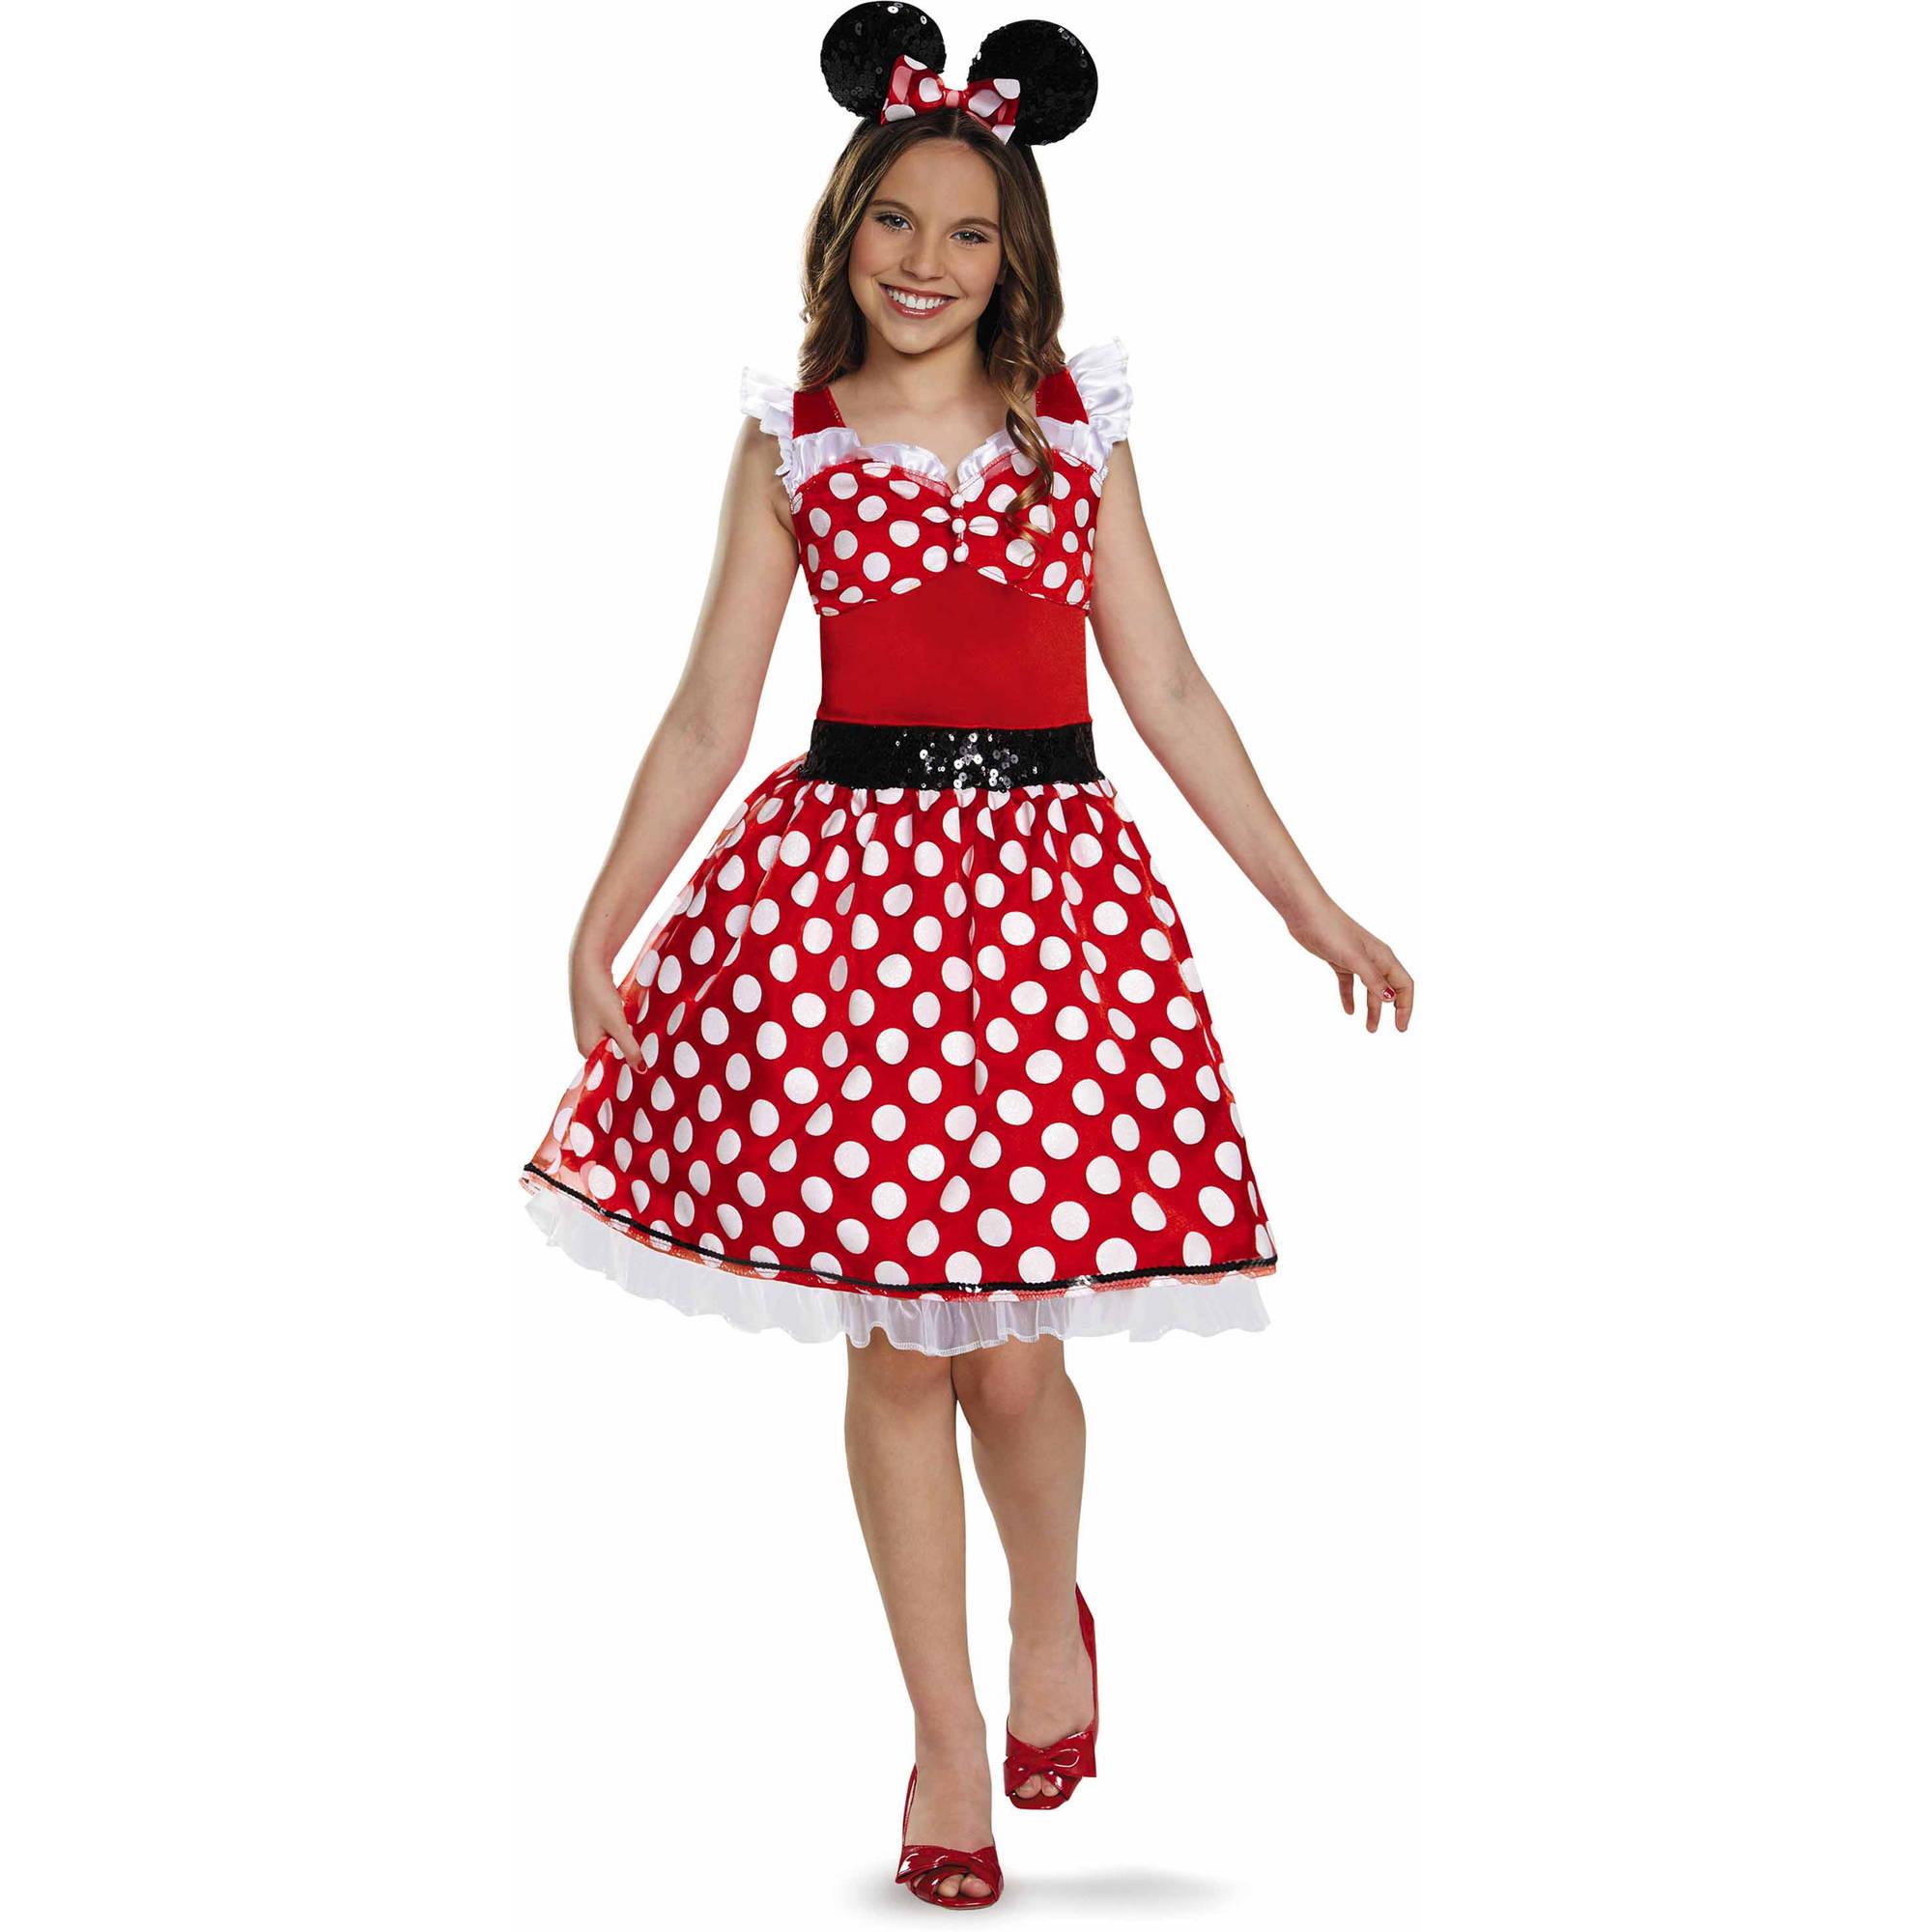 Red Minnie Mouse Tween Halloween Costume